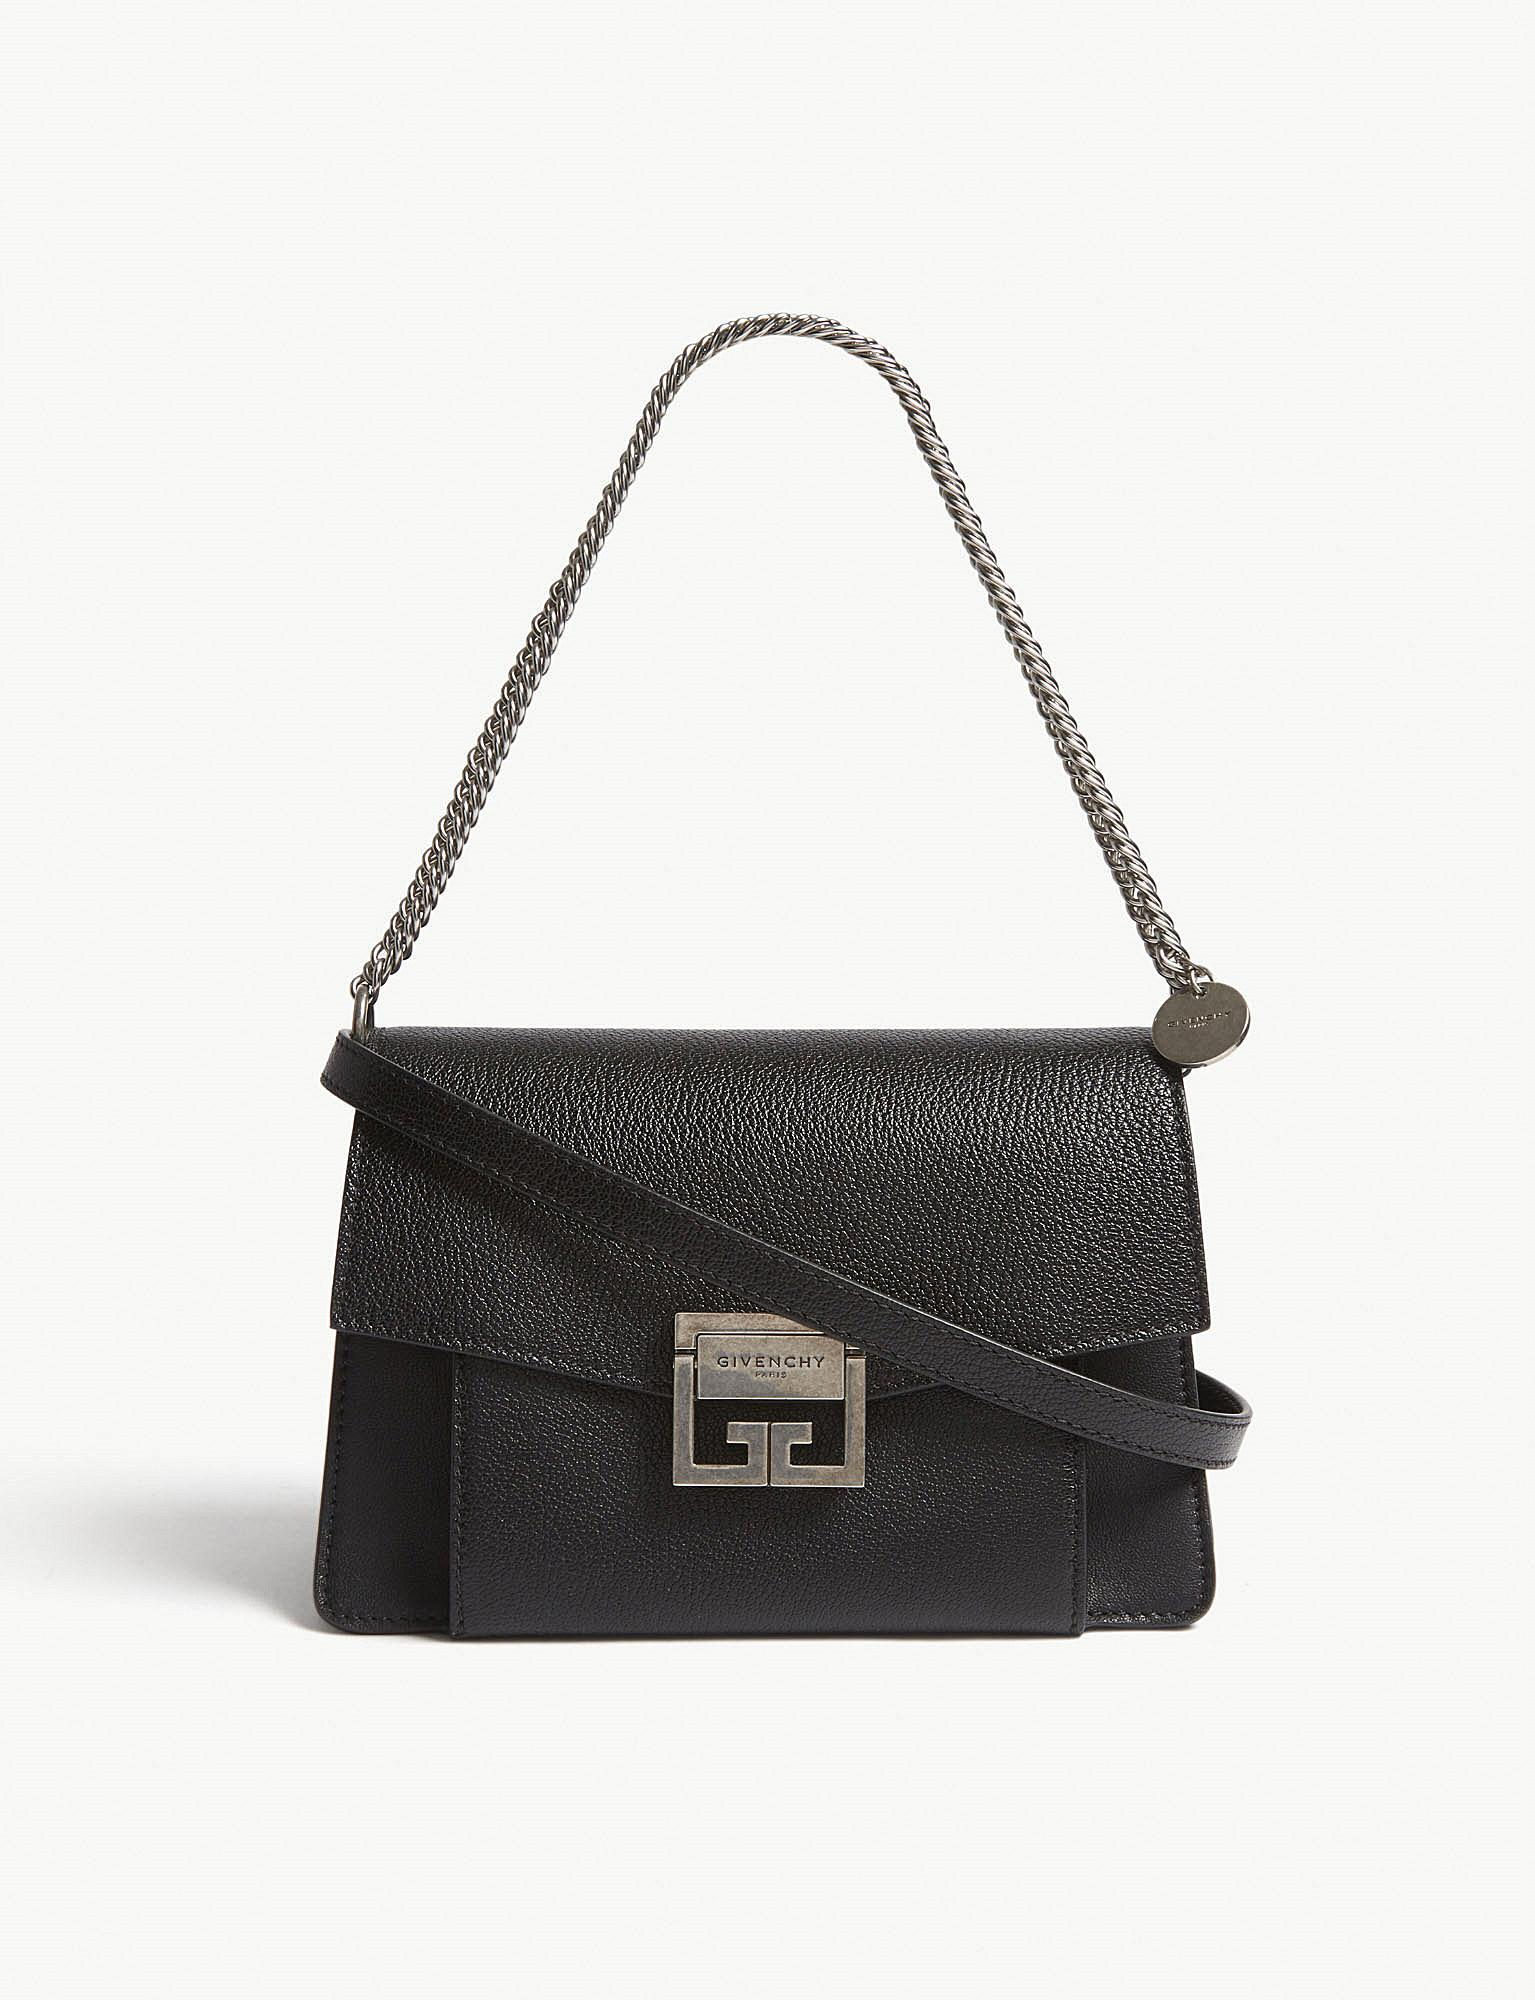 229e293686e1f Givenchy - Black Gv3 Small Leather Shoulder Bag - Lyst. View fullscreen